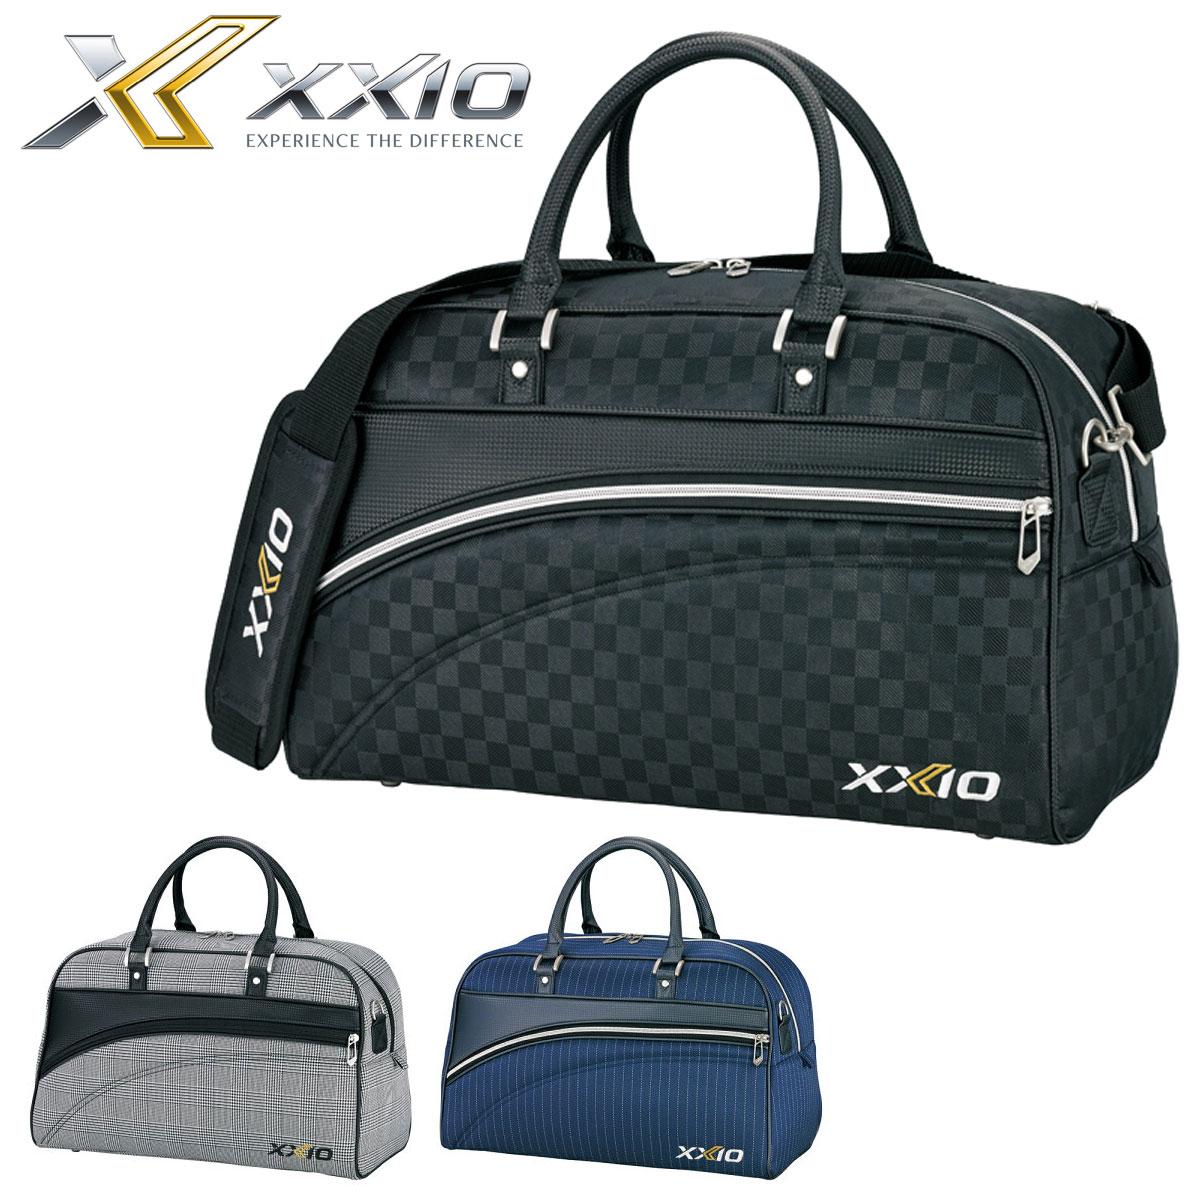 DUNLOP(ダンロップ)日本正規品 XXIO(ゼクシオ) スポーツバッグ(ボストンバッグ) 2020新製品 「GGB-X111」【あす楽対応】